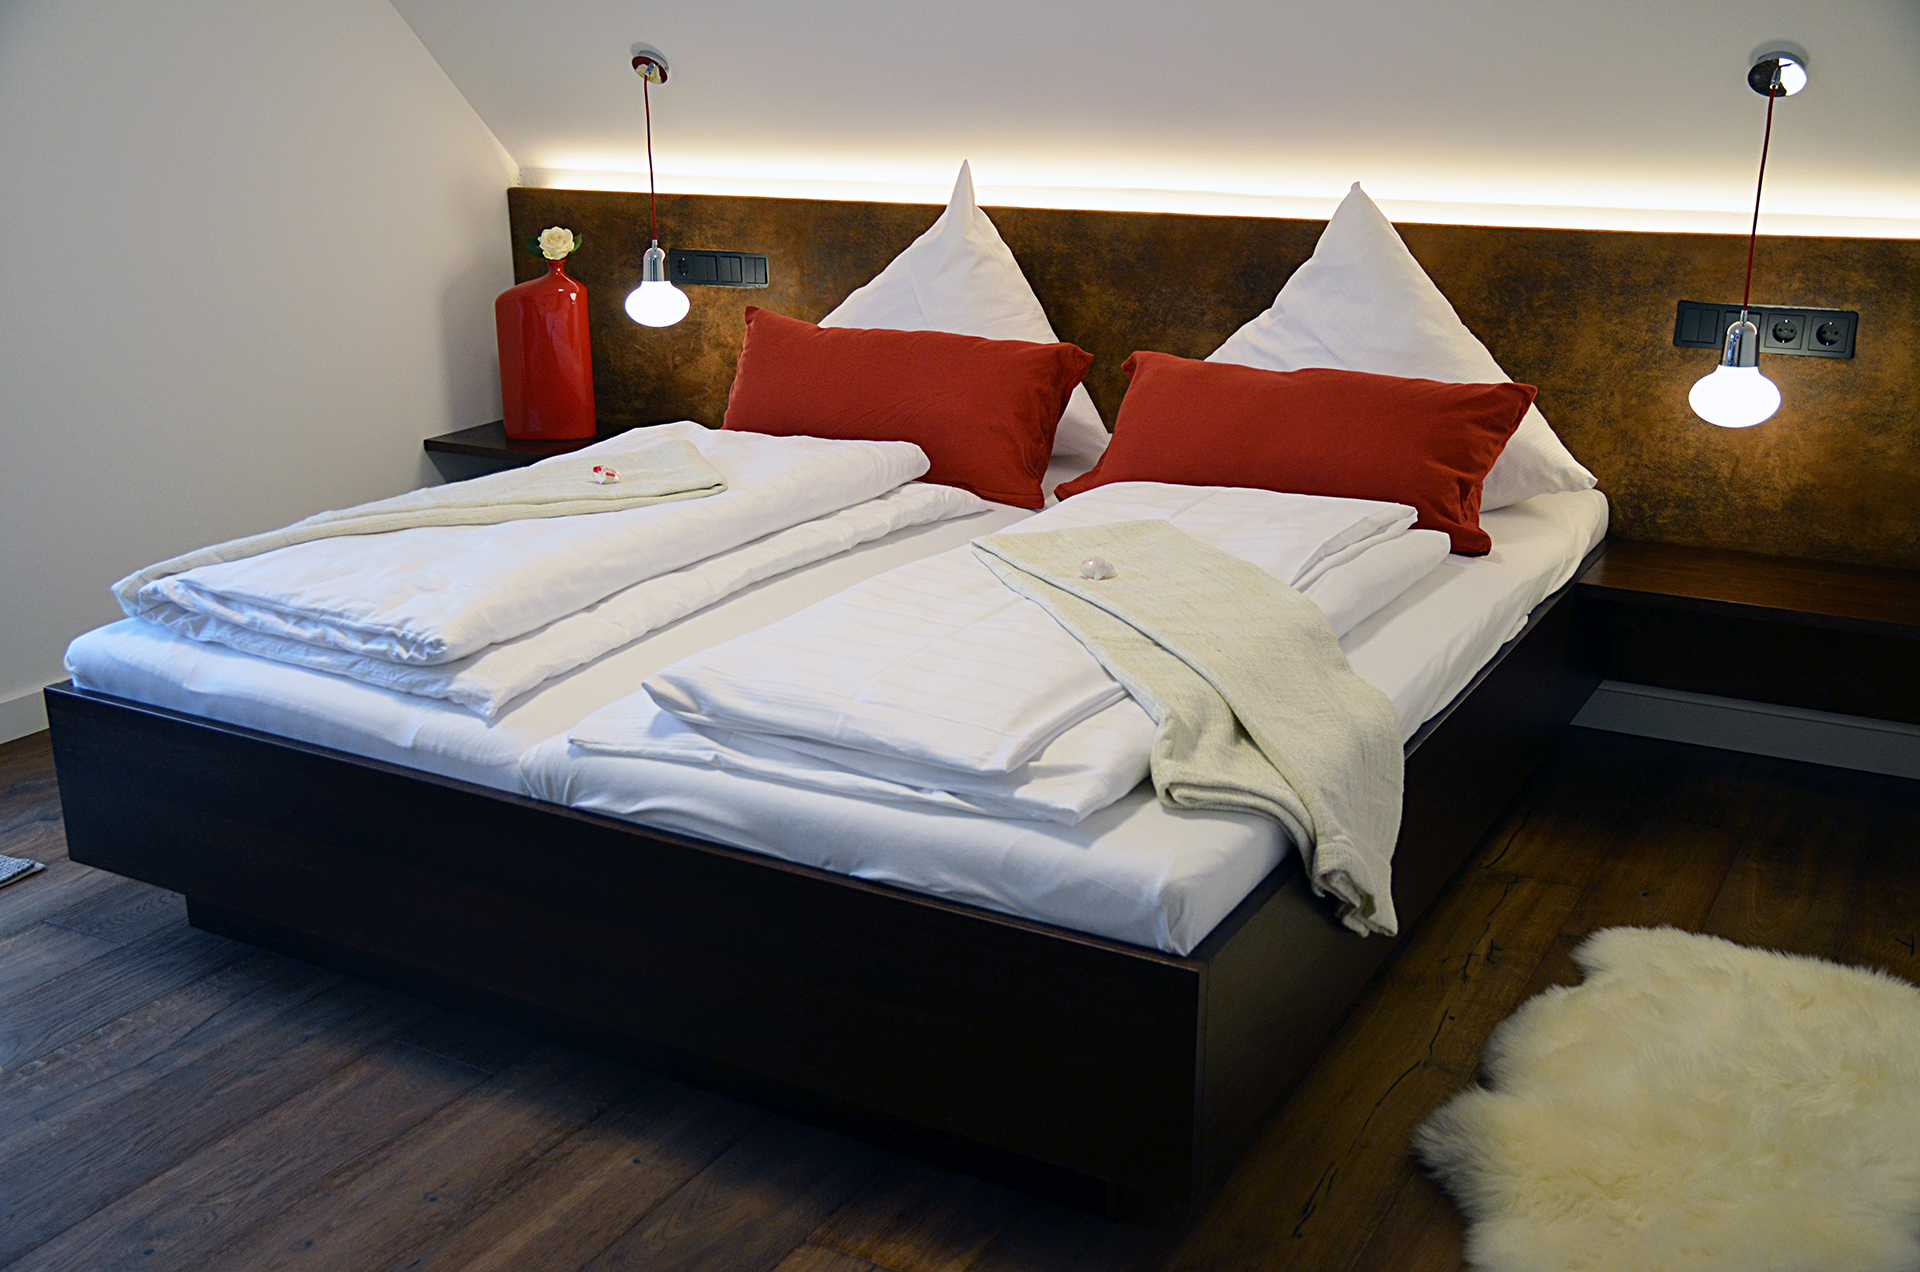 Bezaubernd Bett Romantisch Ideen Von Quartier